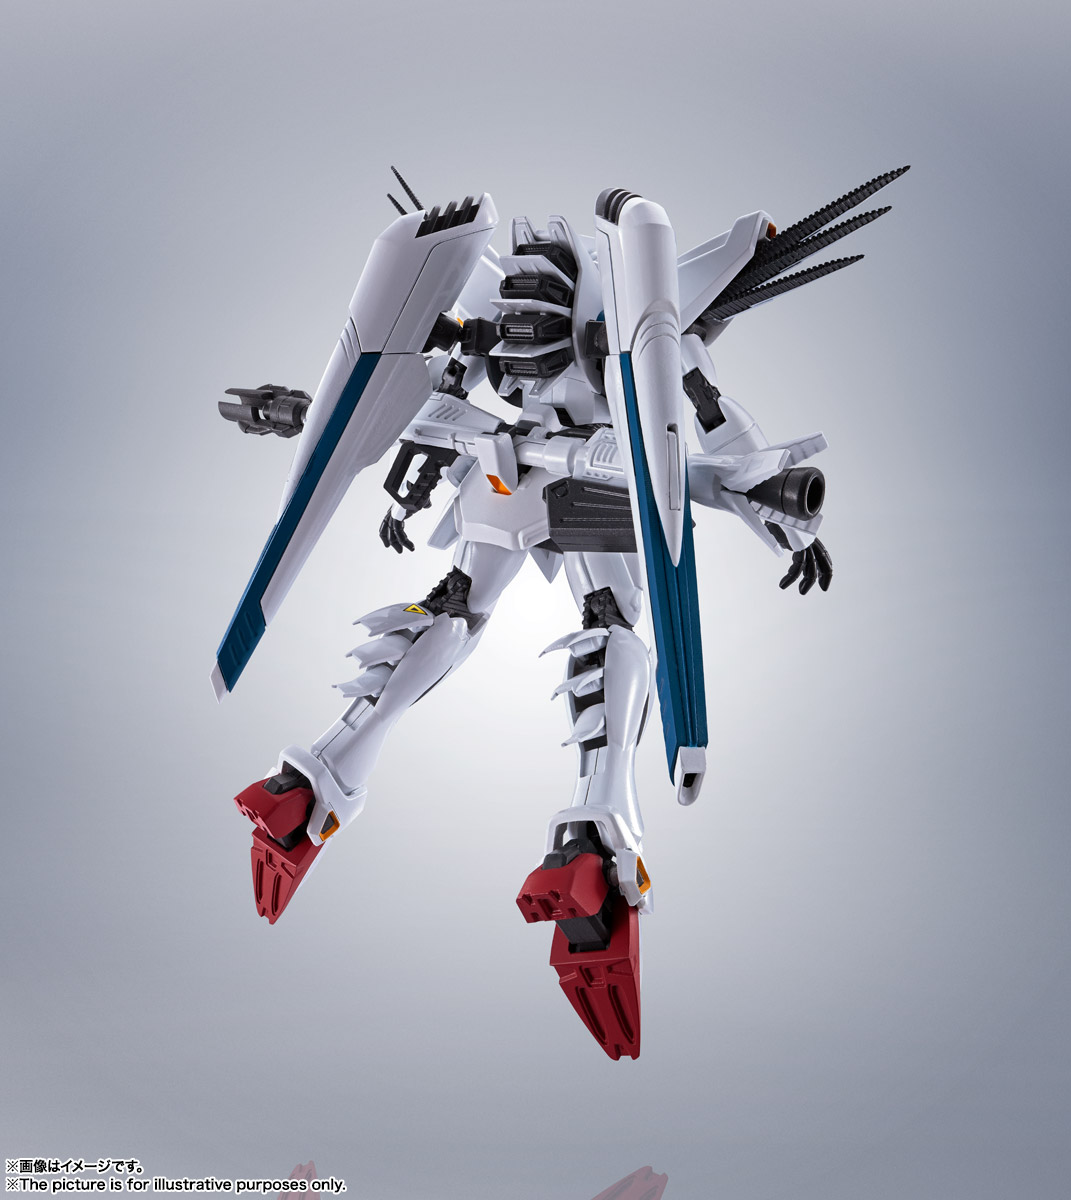 ROBOT魂〈SIDE MS〉『ガンダムF91 EVOLUTION-SPEC』機動戦士ガンダムF91 可動フィギュア-011